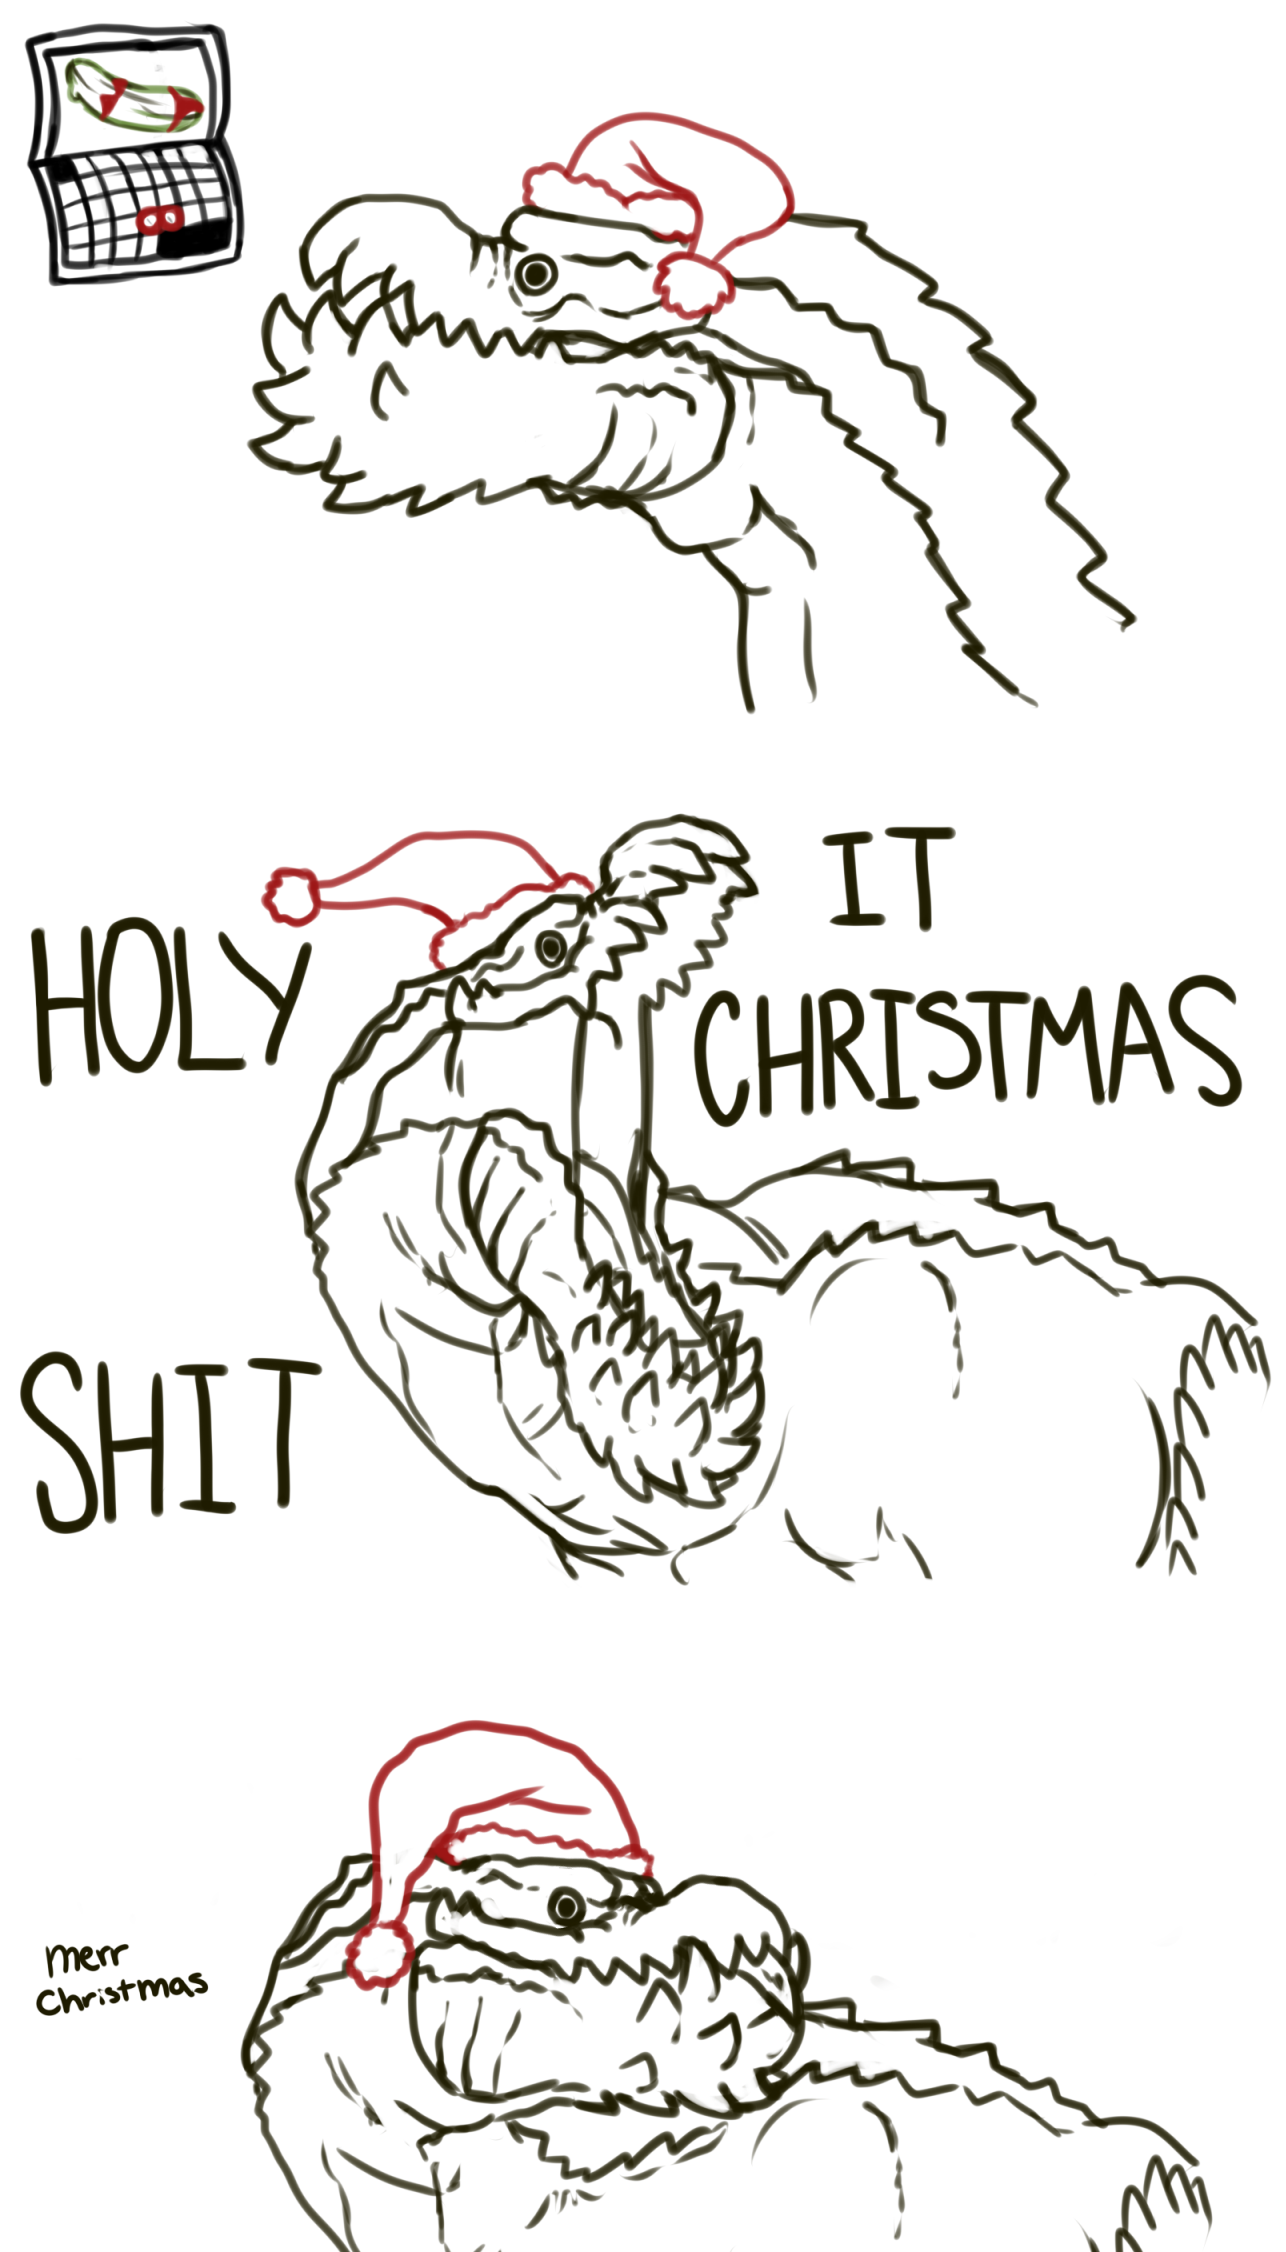 Deviljho Merr Christmas | Merr Chrismas | Know Your Meme